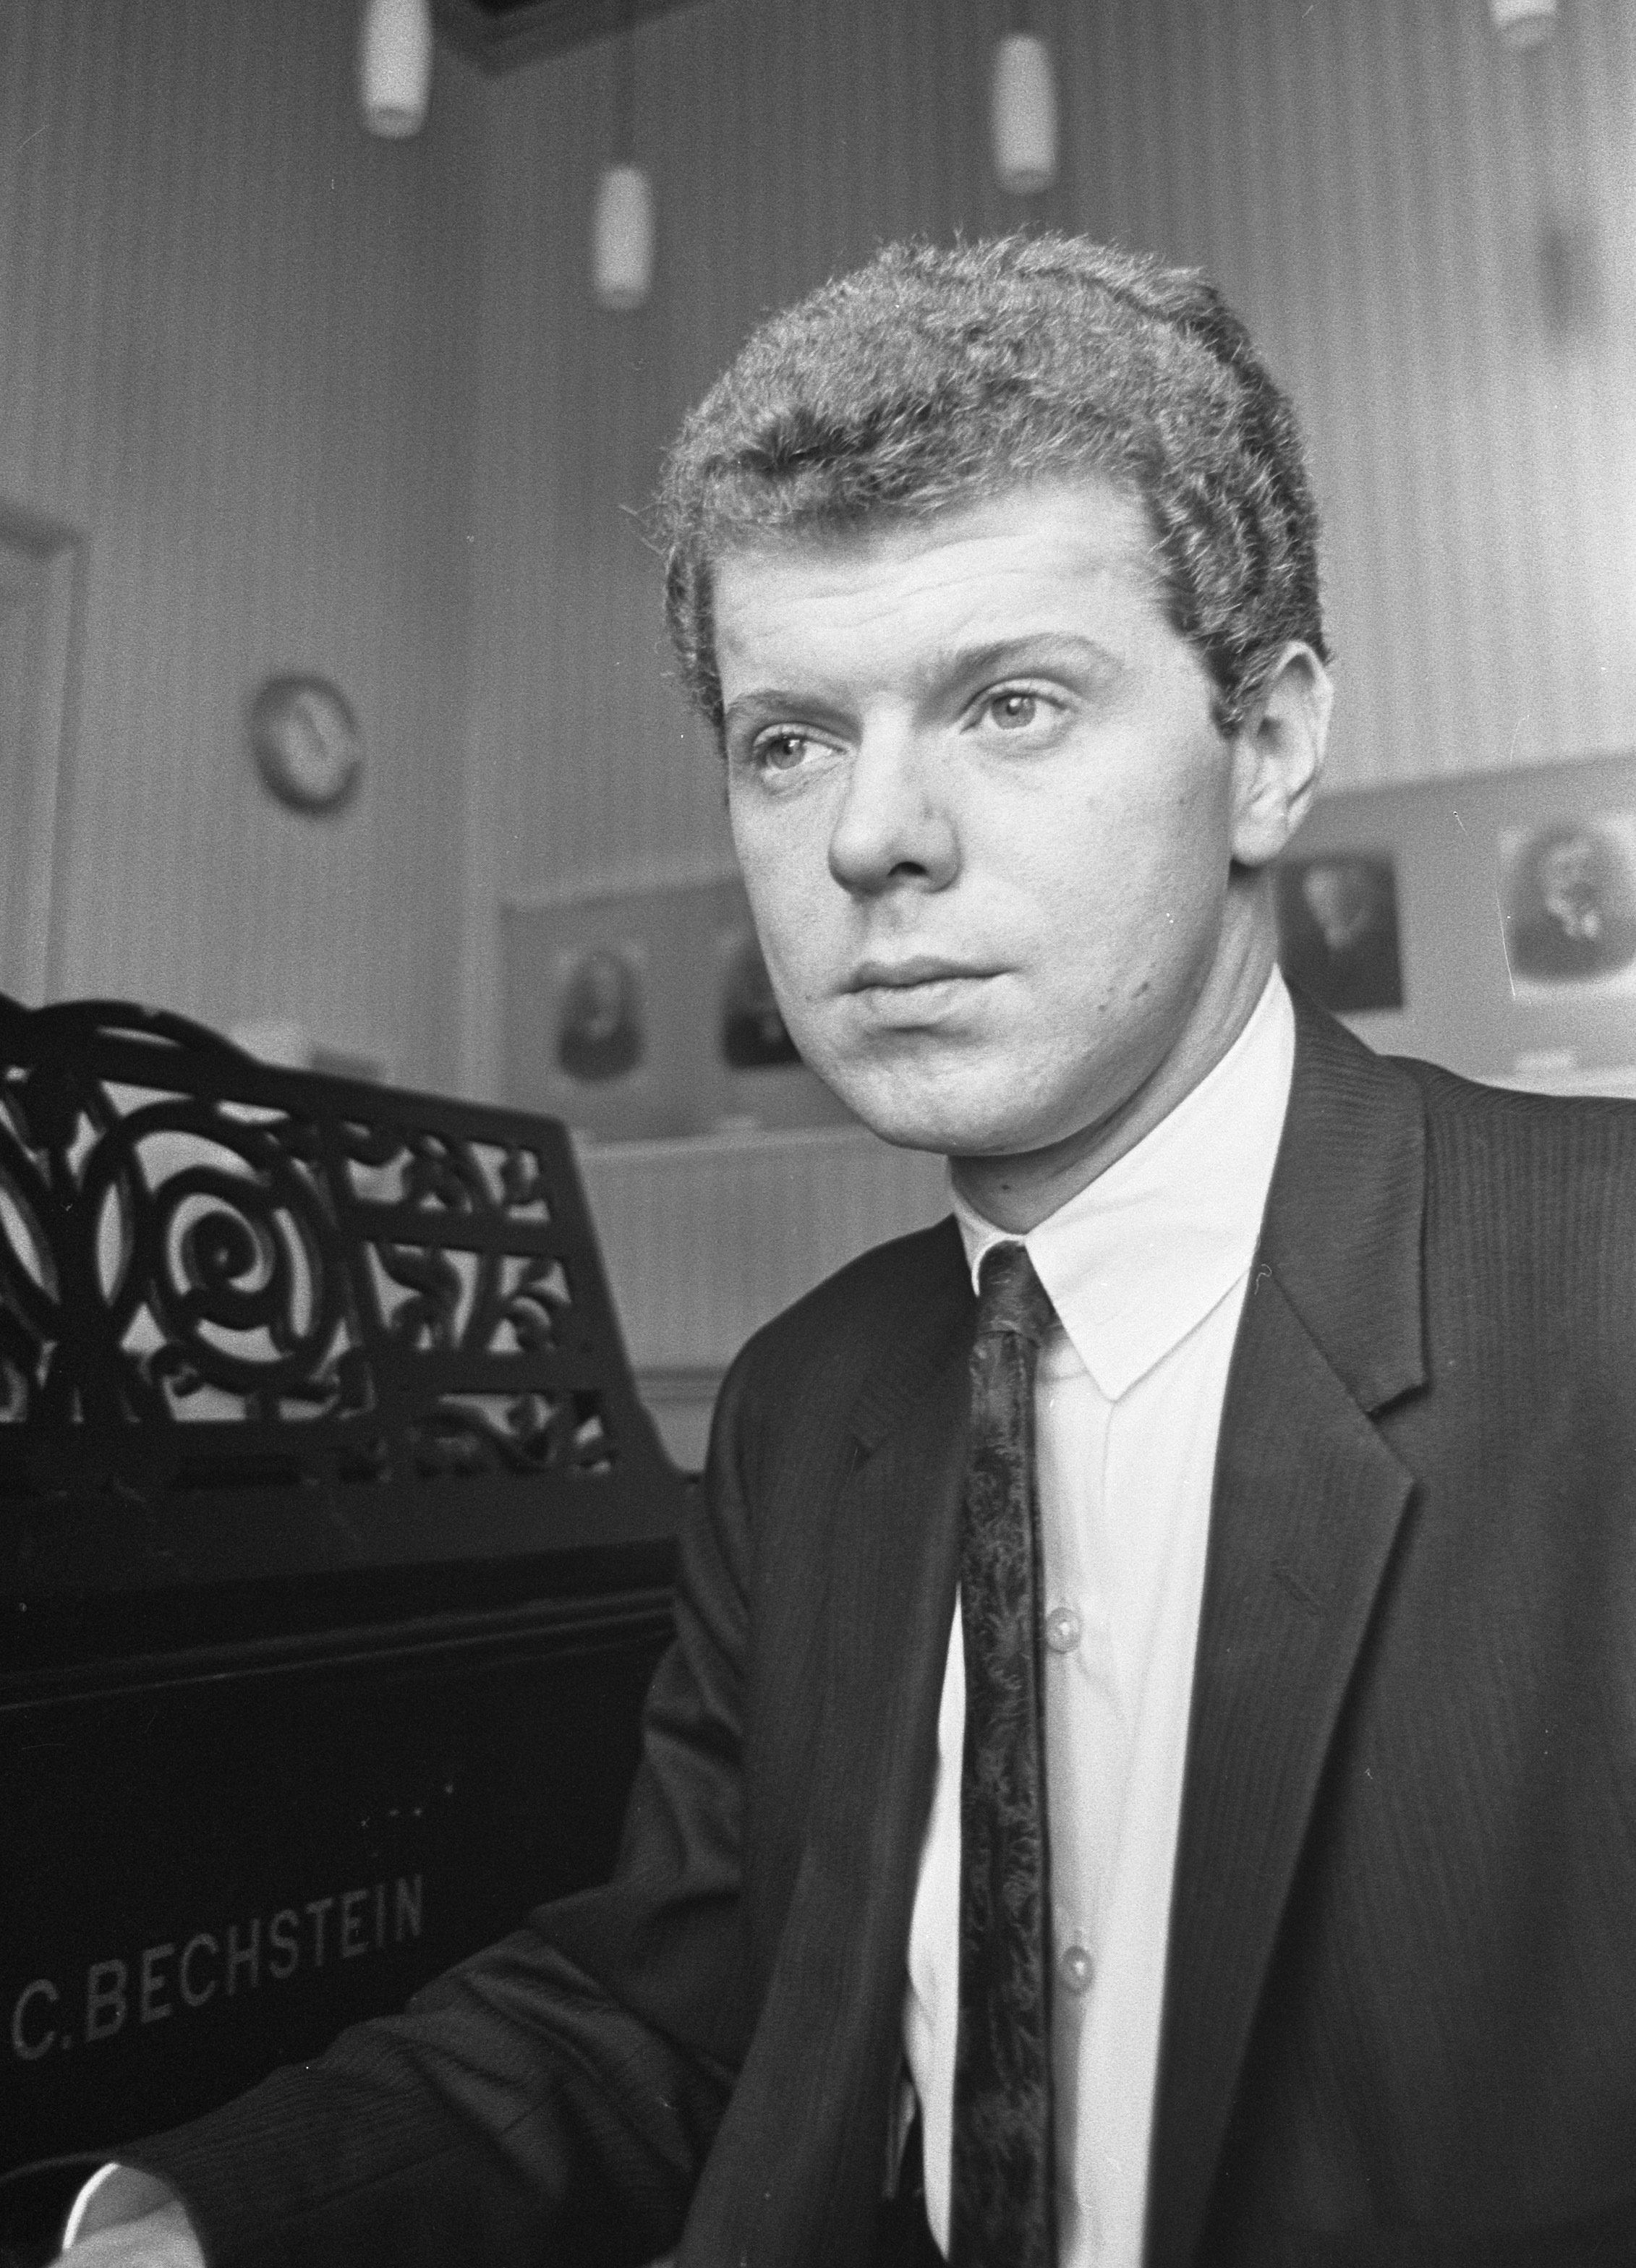 Pianist Van Cliburn